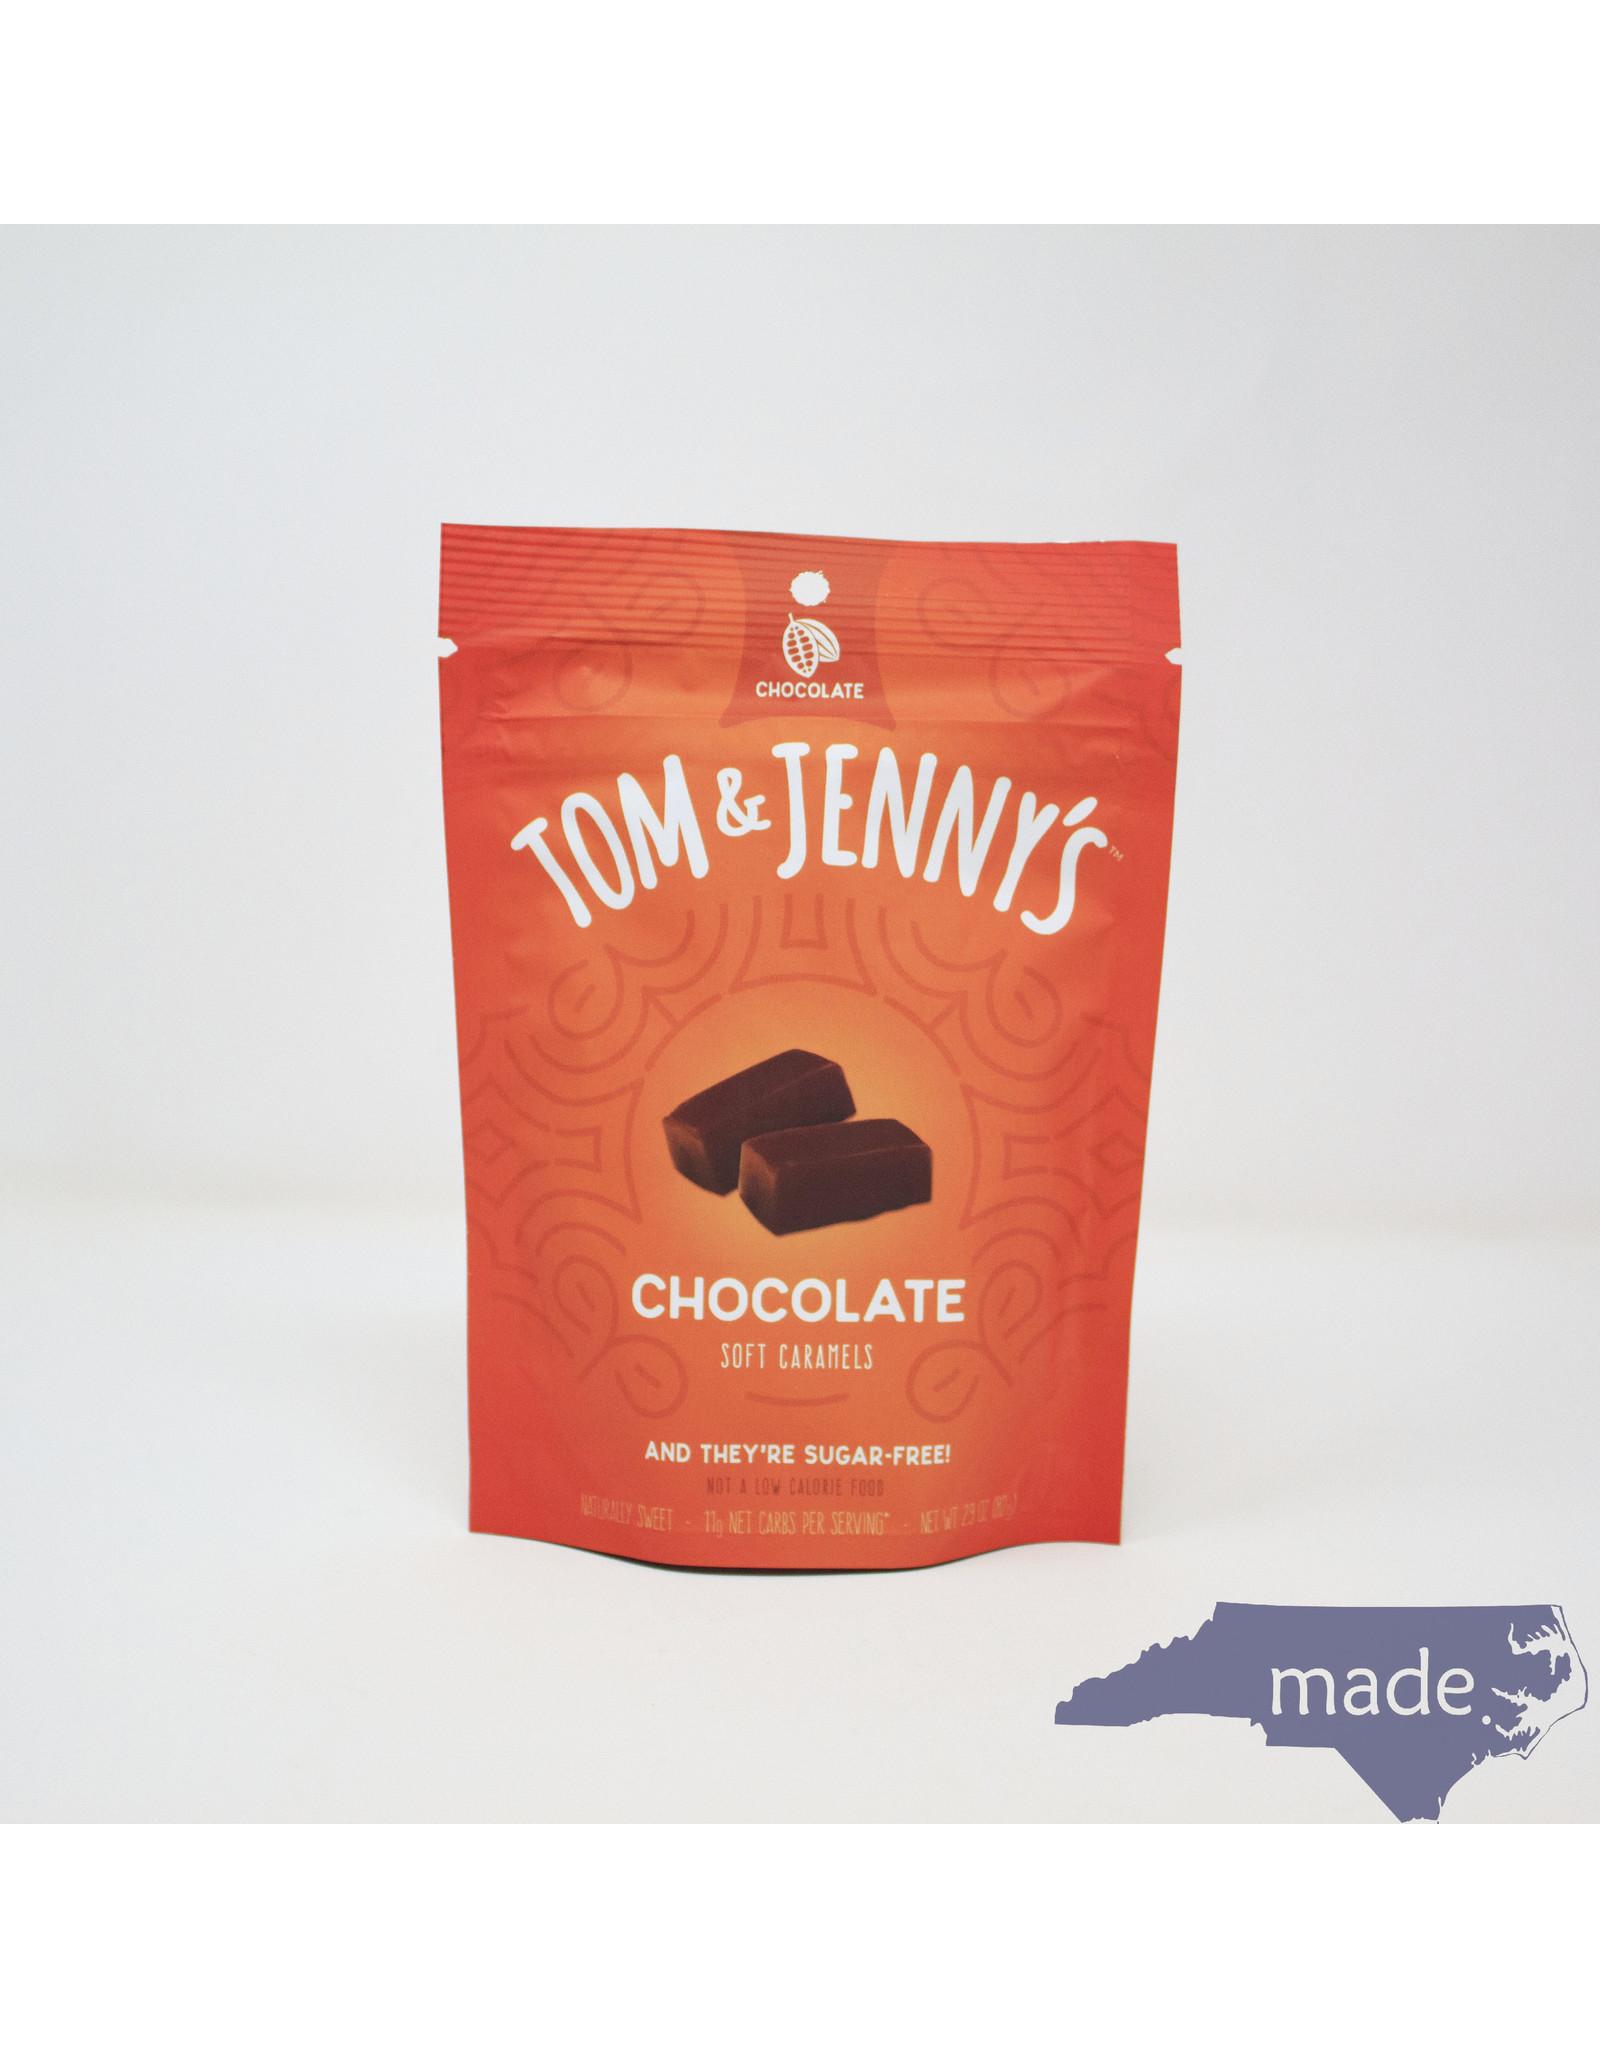 Tom & Jenny's Chocolate Soft Caramels - Tom & Jenny's